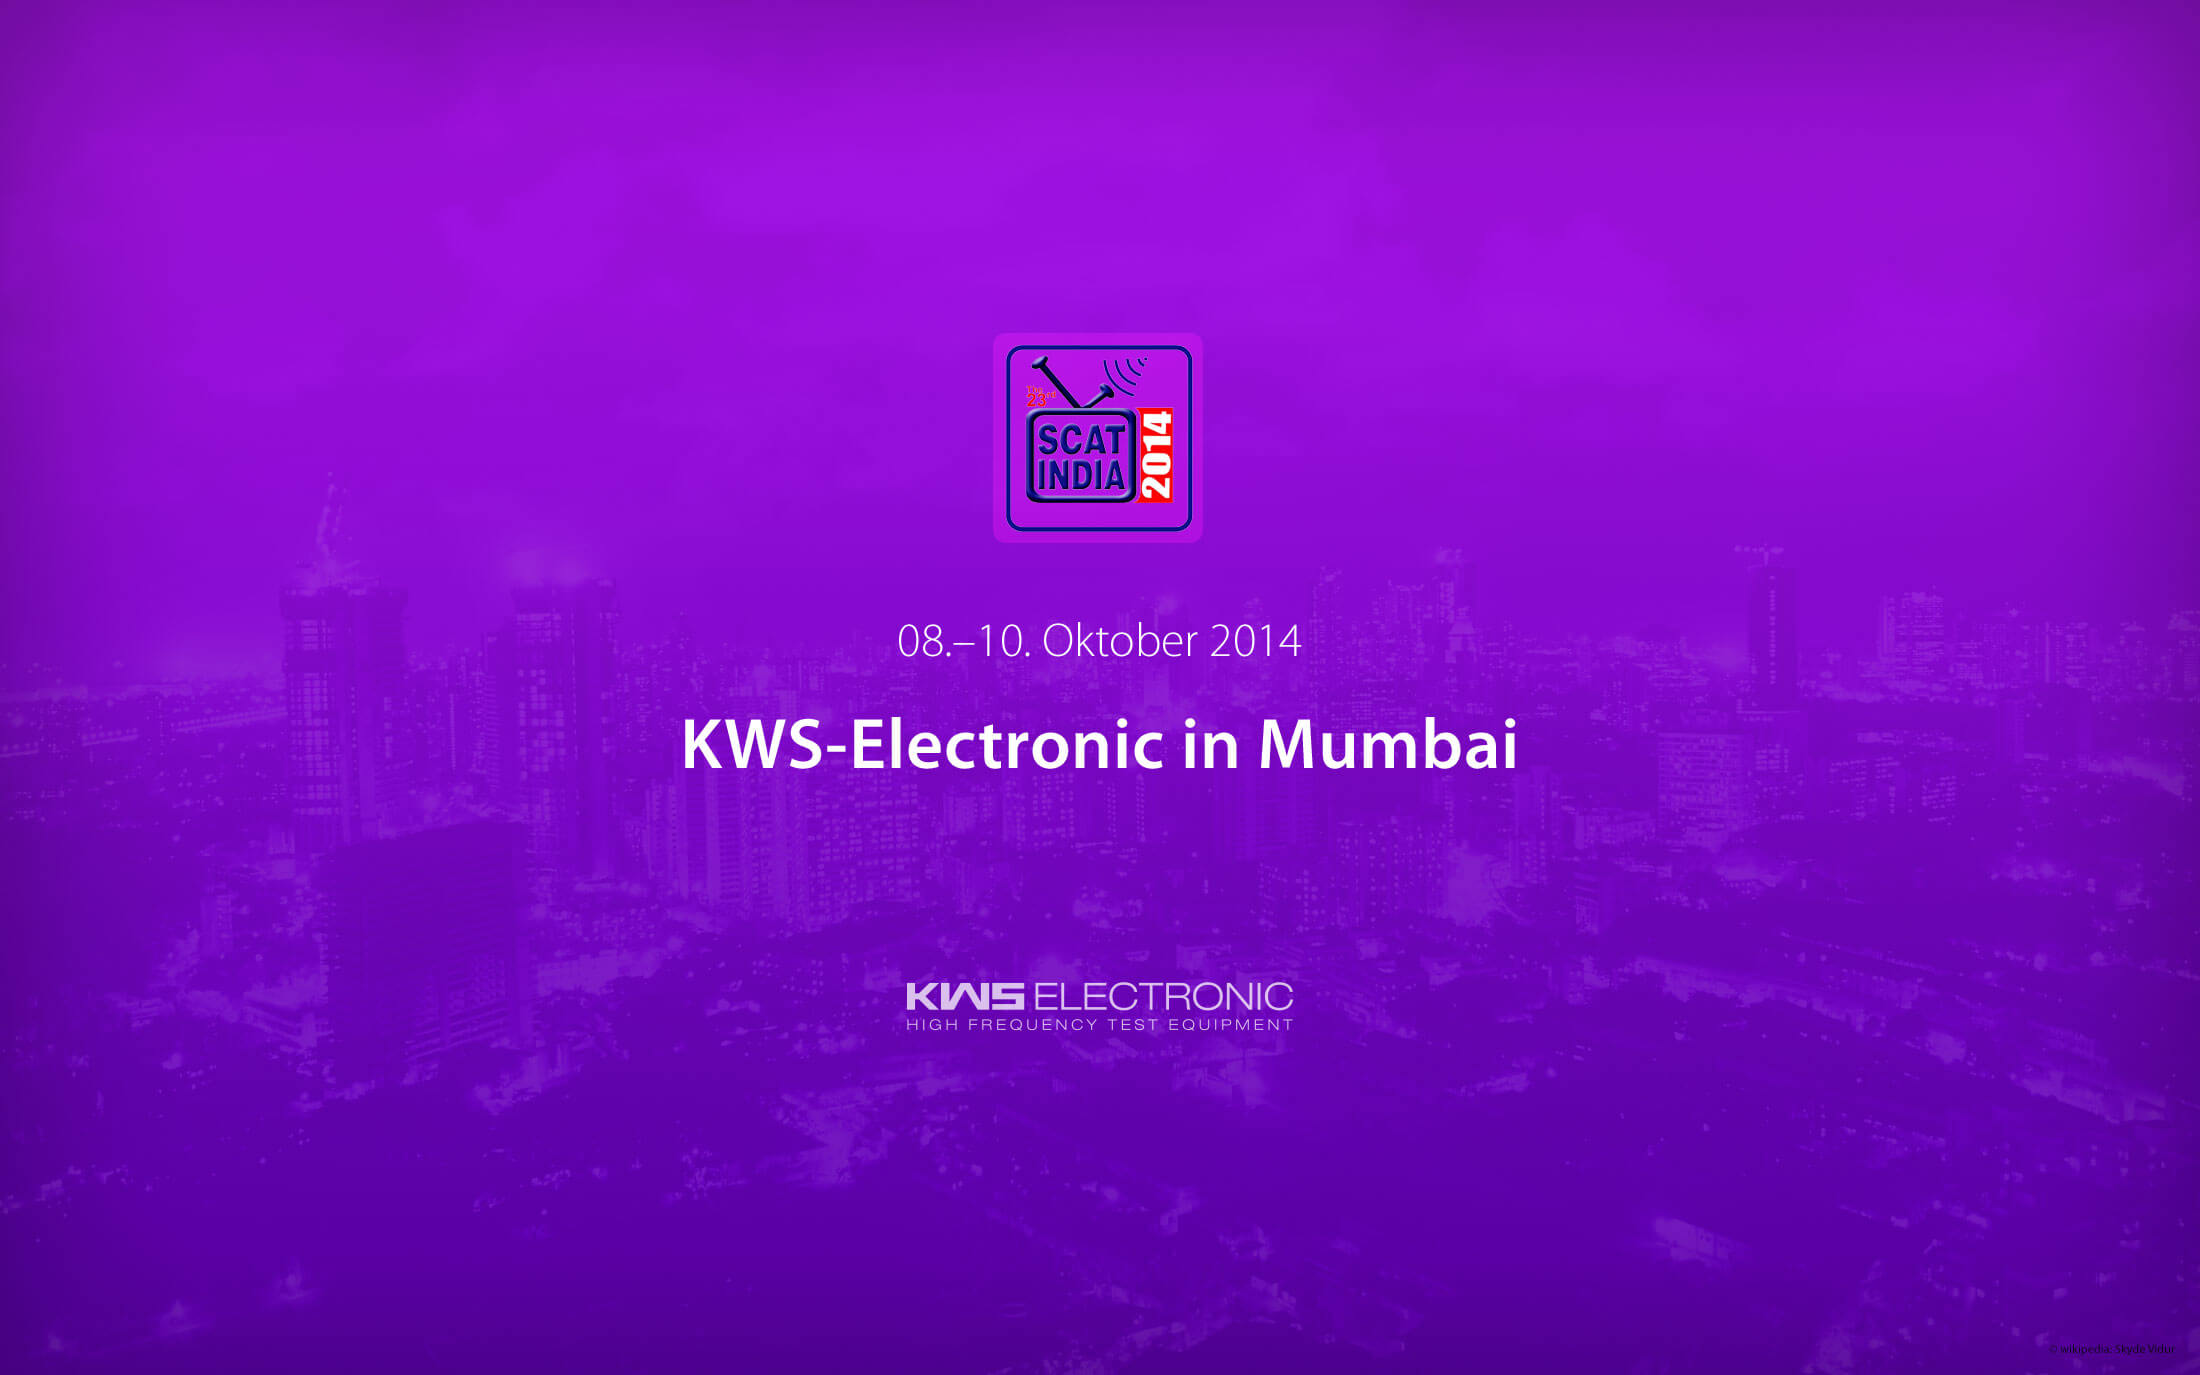 KWS-Electronic auf der SCAT India 2014 in Mumbai